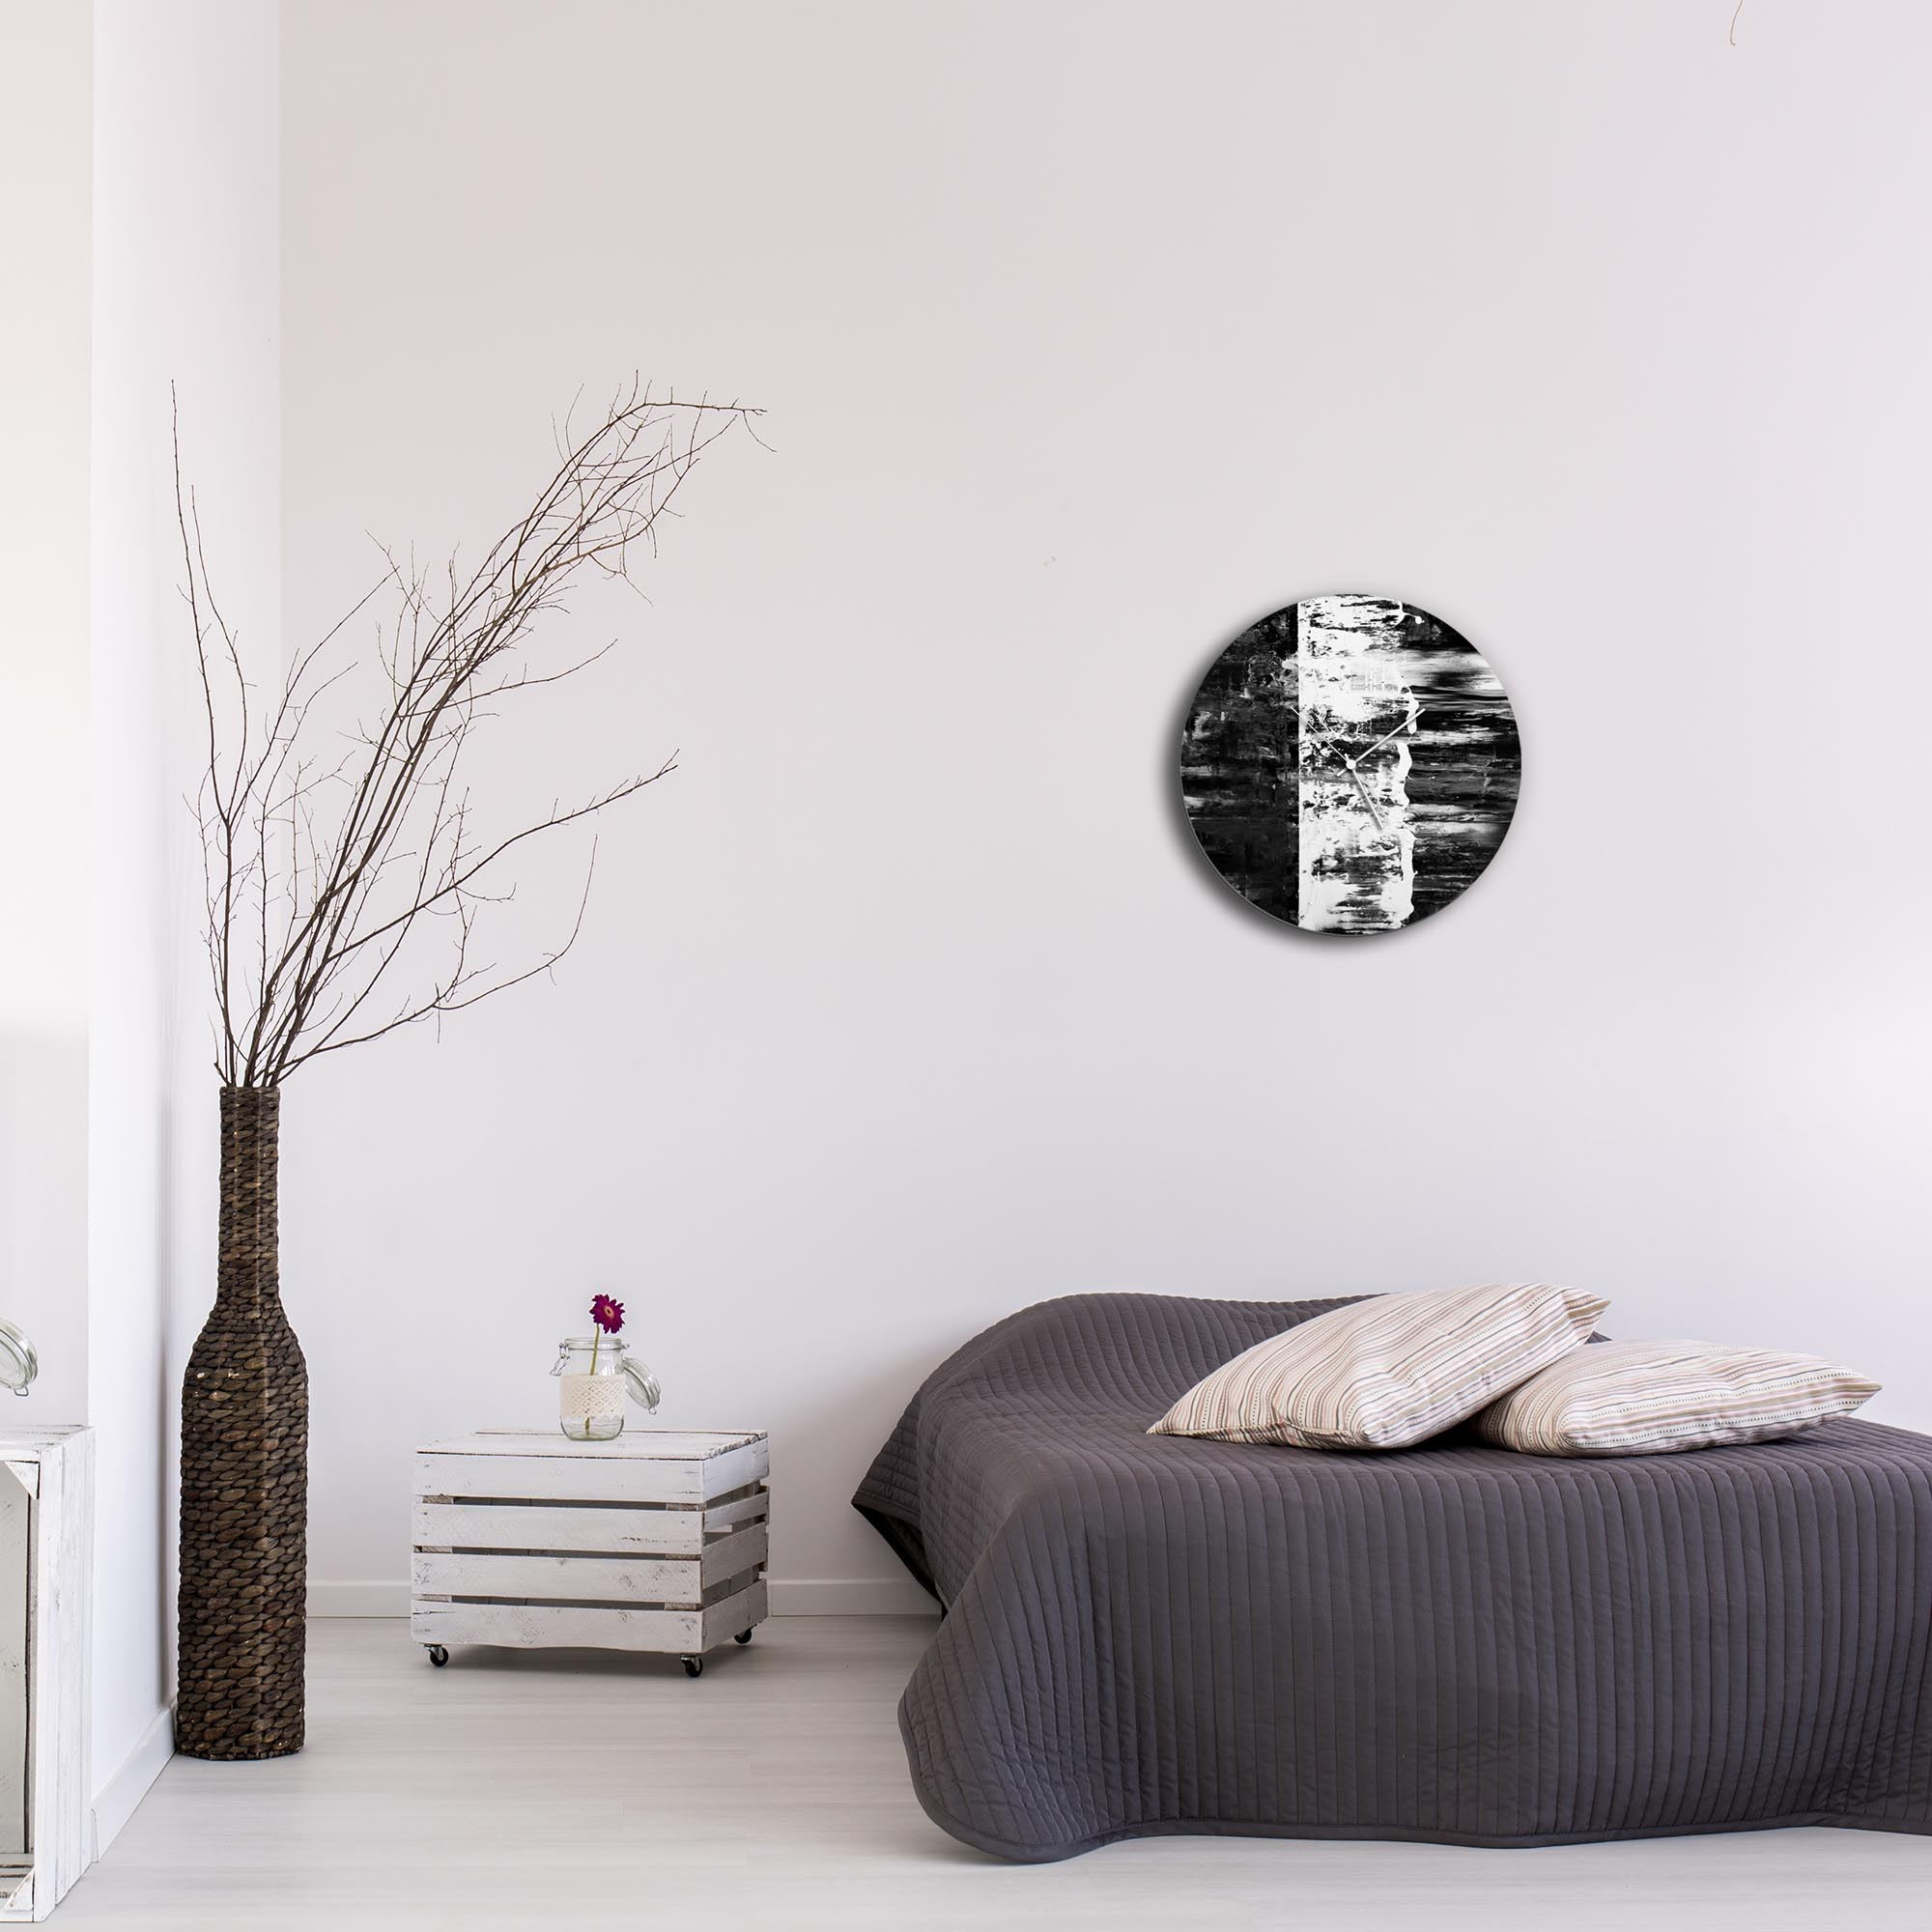 Black Street Circle Clock by Mendo Vasilevski - Urban Abstract Home Decor - Lifestyle View